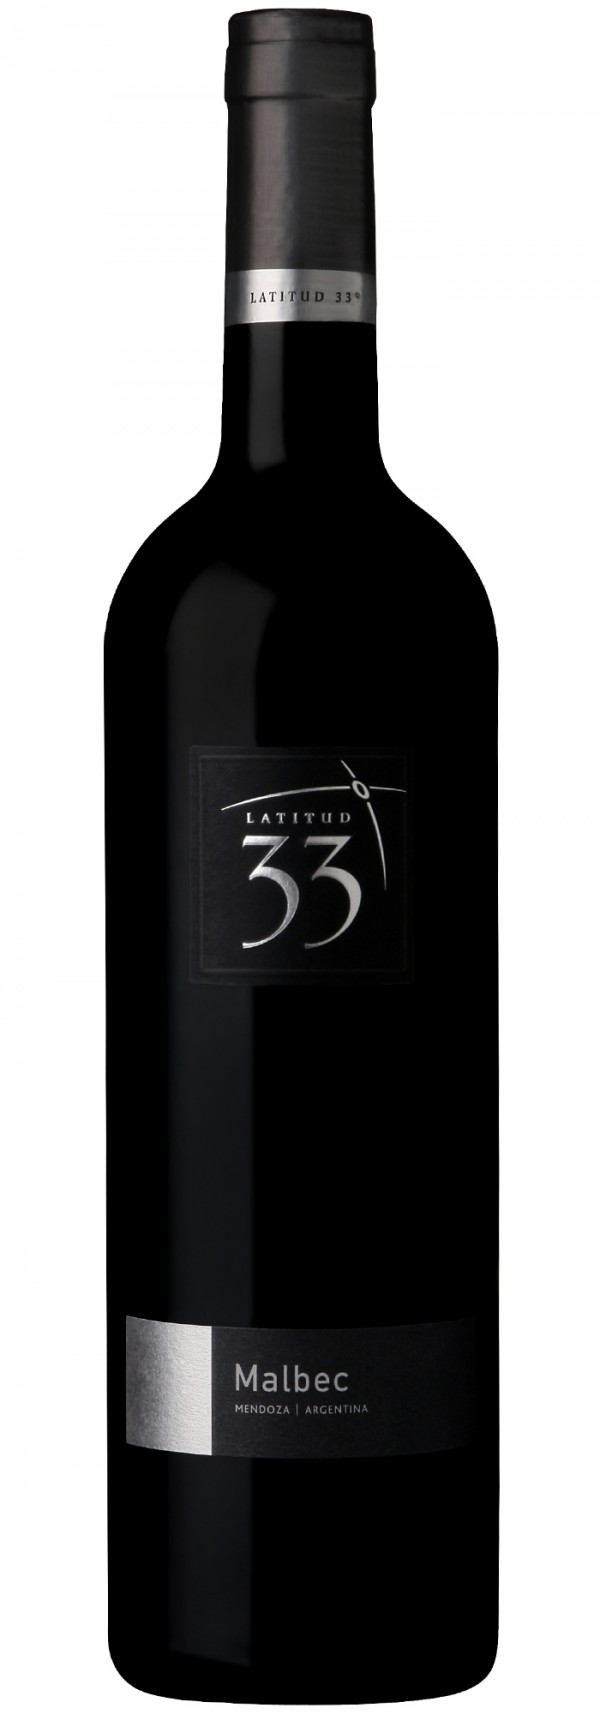 Vinho argentino Latitud 33° malbec 750 ml